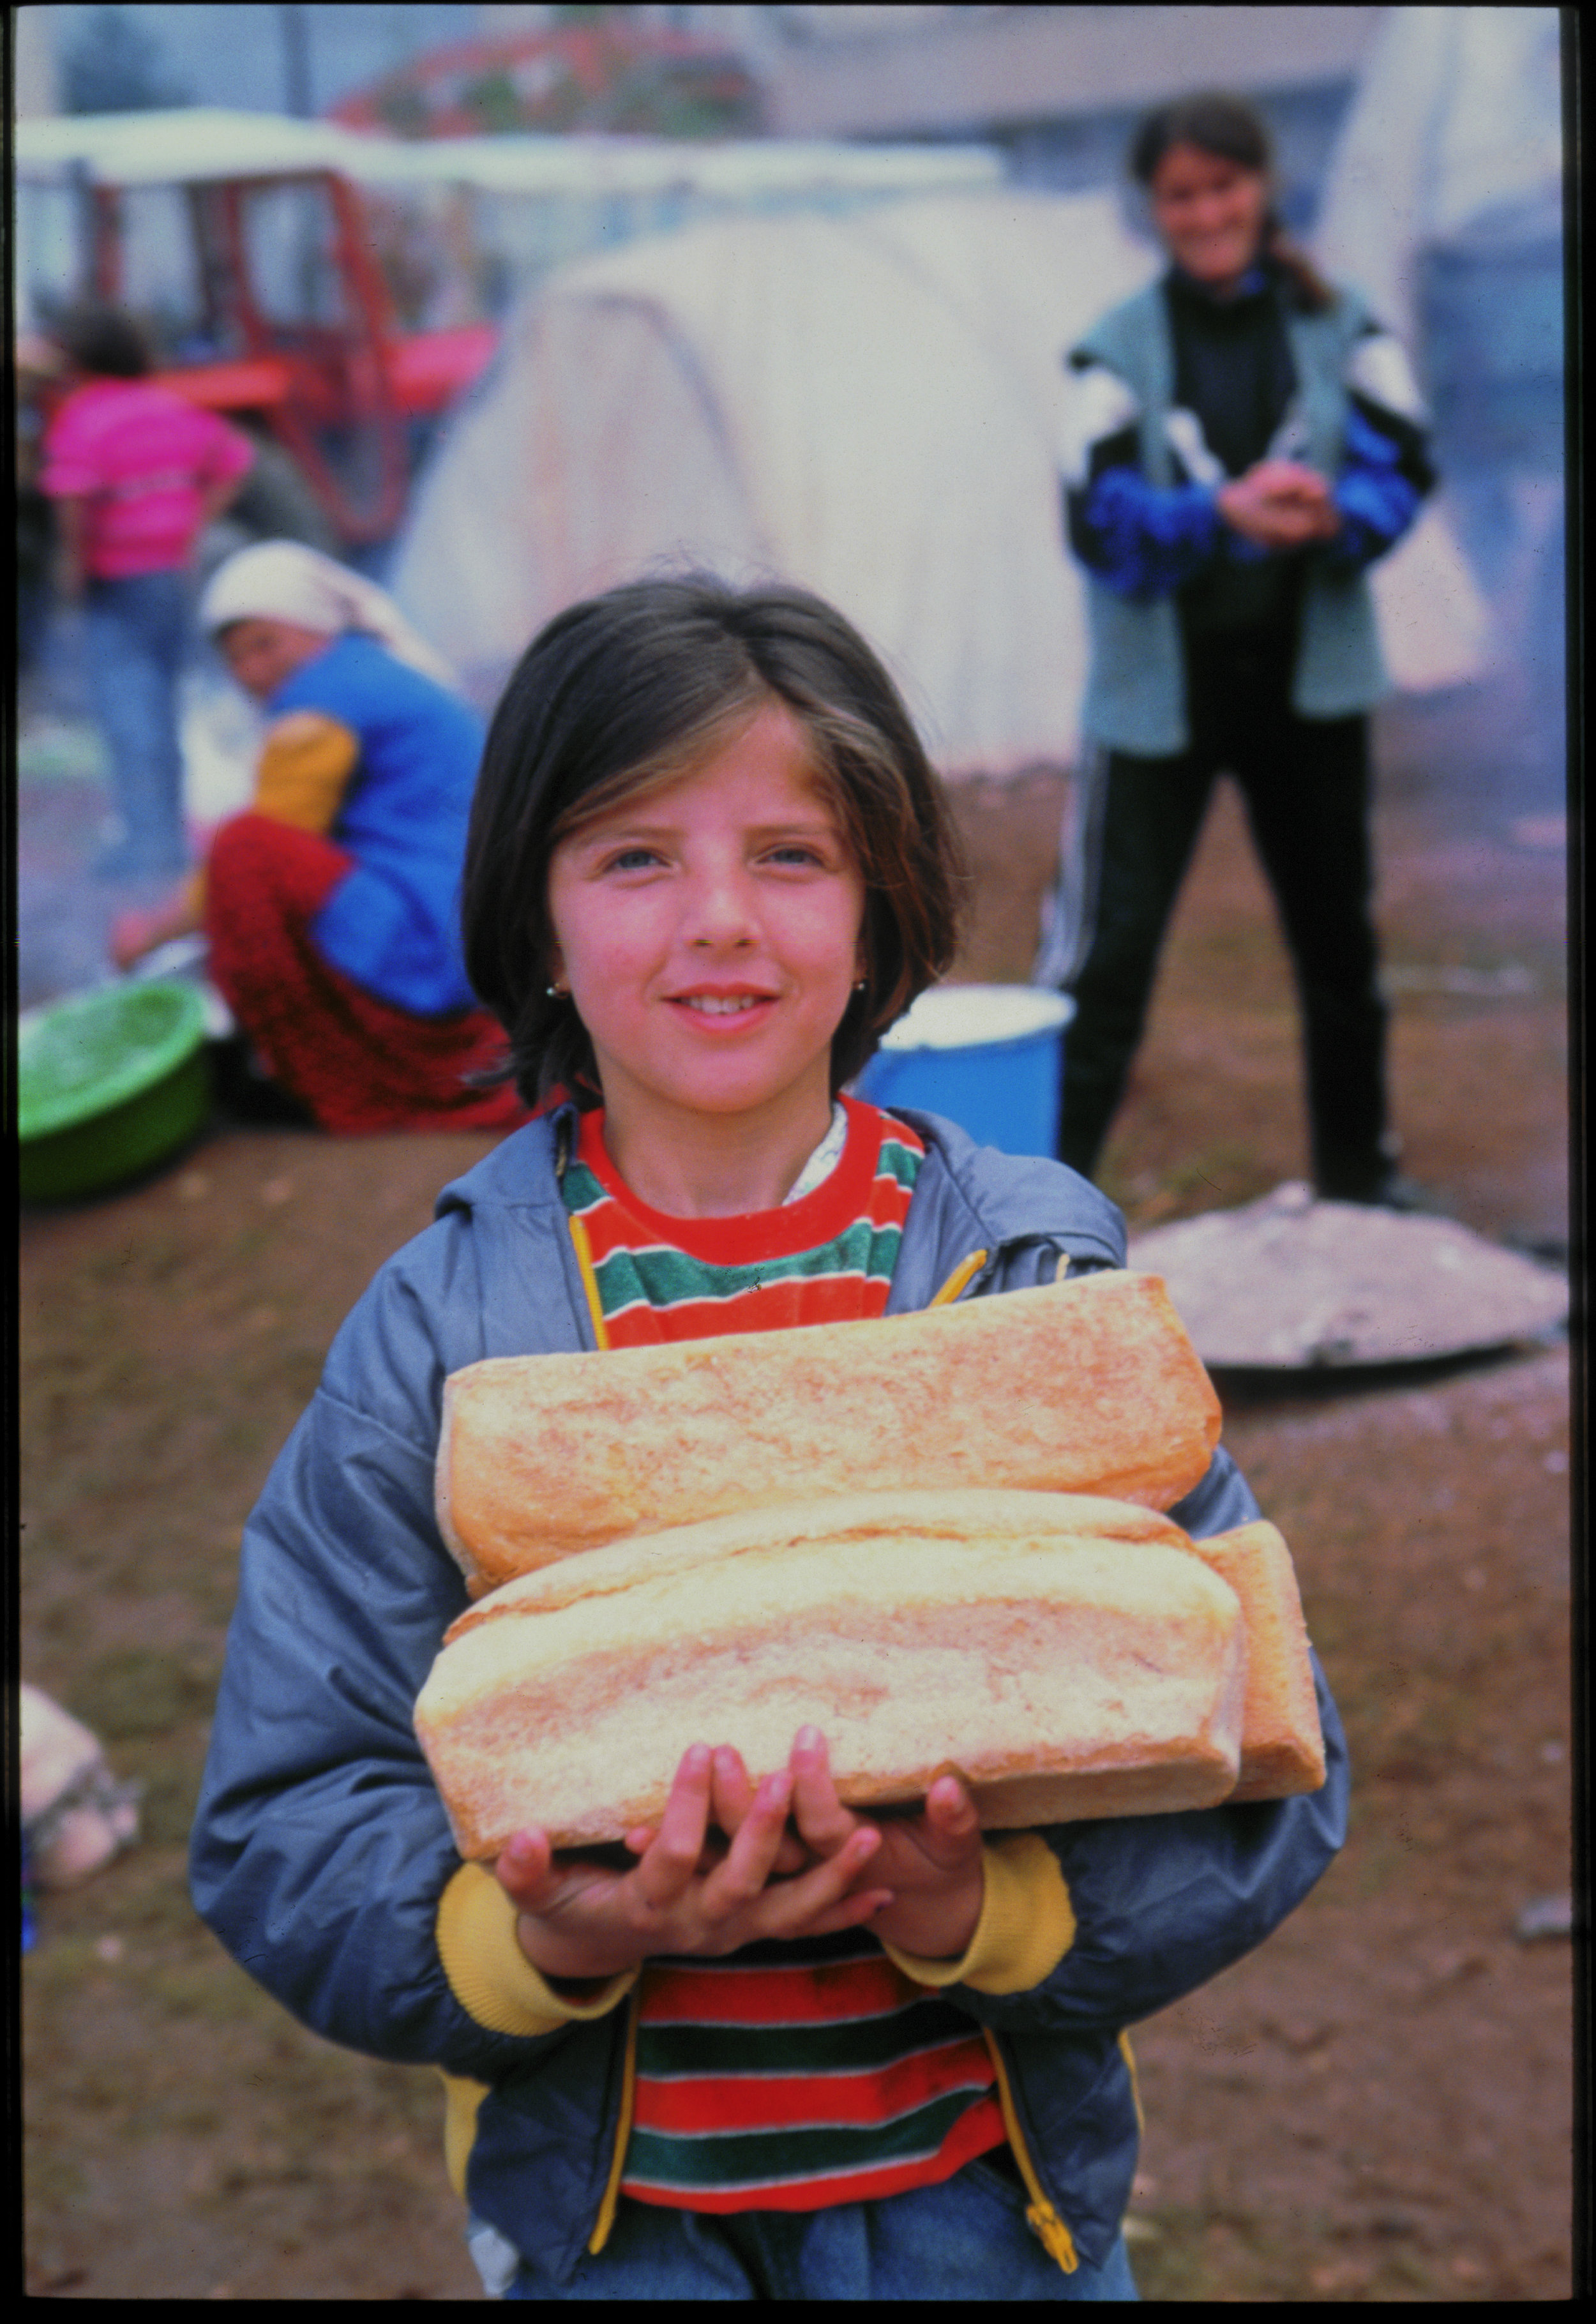 Kosovo 1999 (Photo by Tom Haskell)